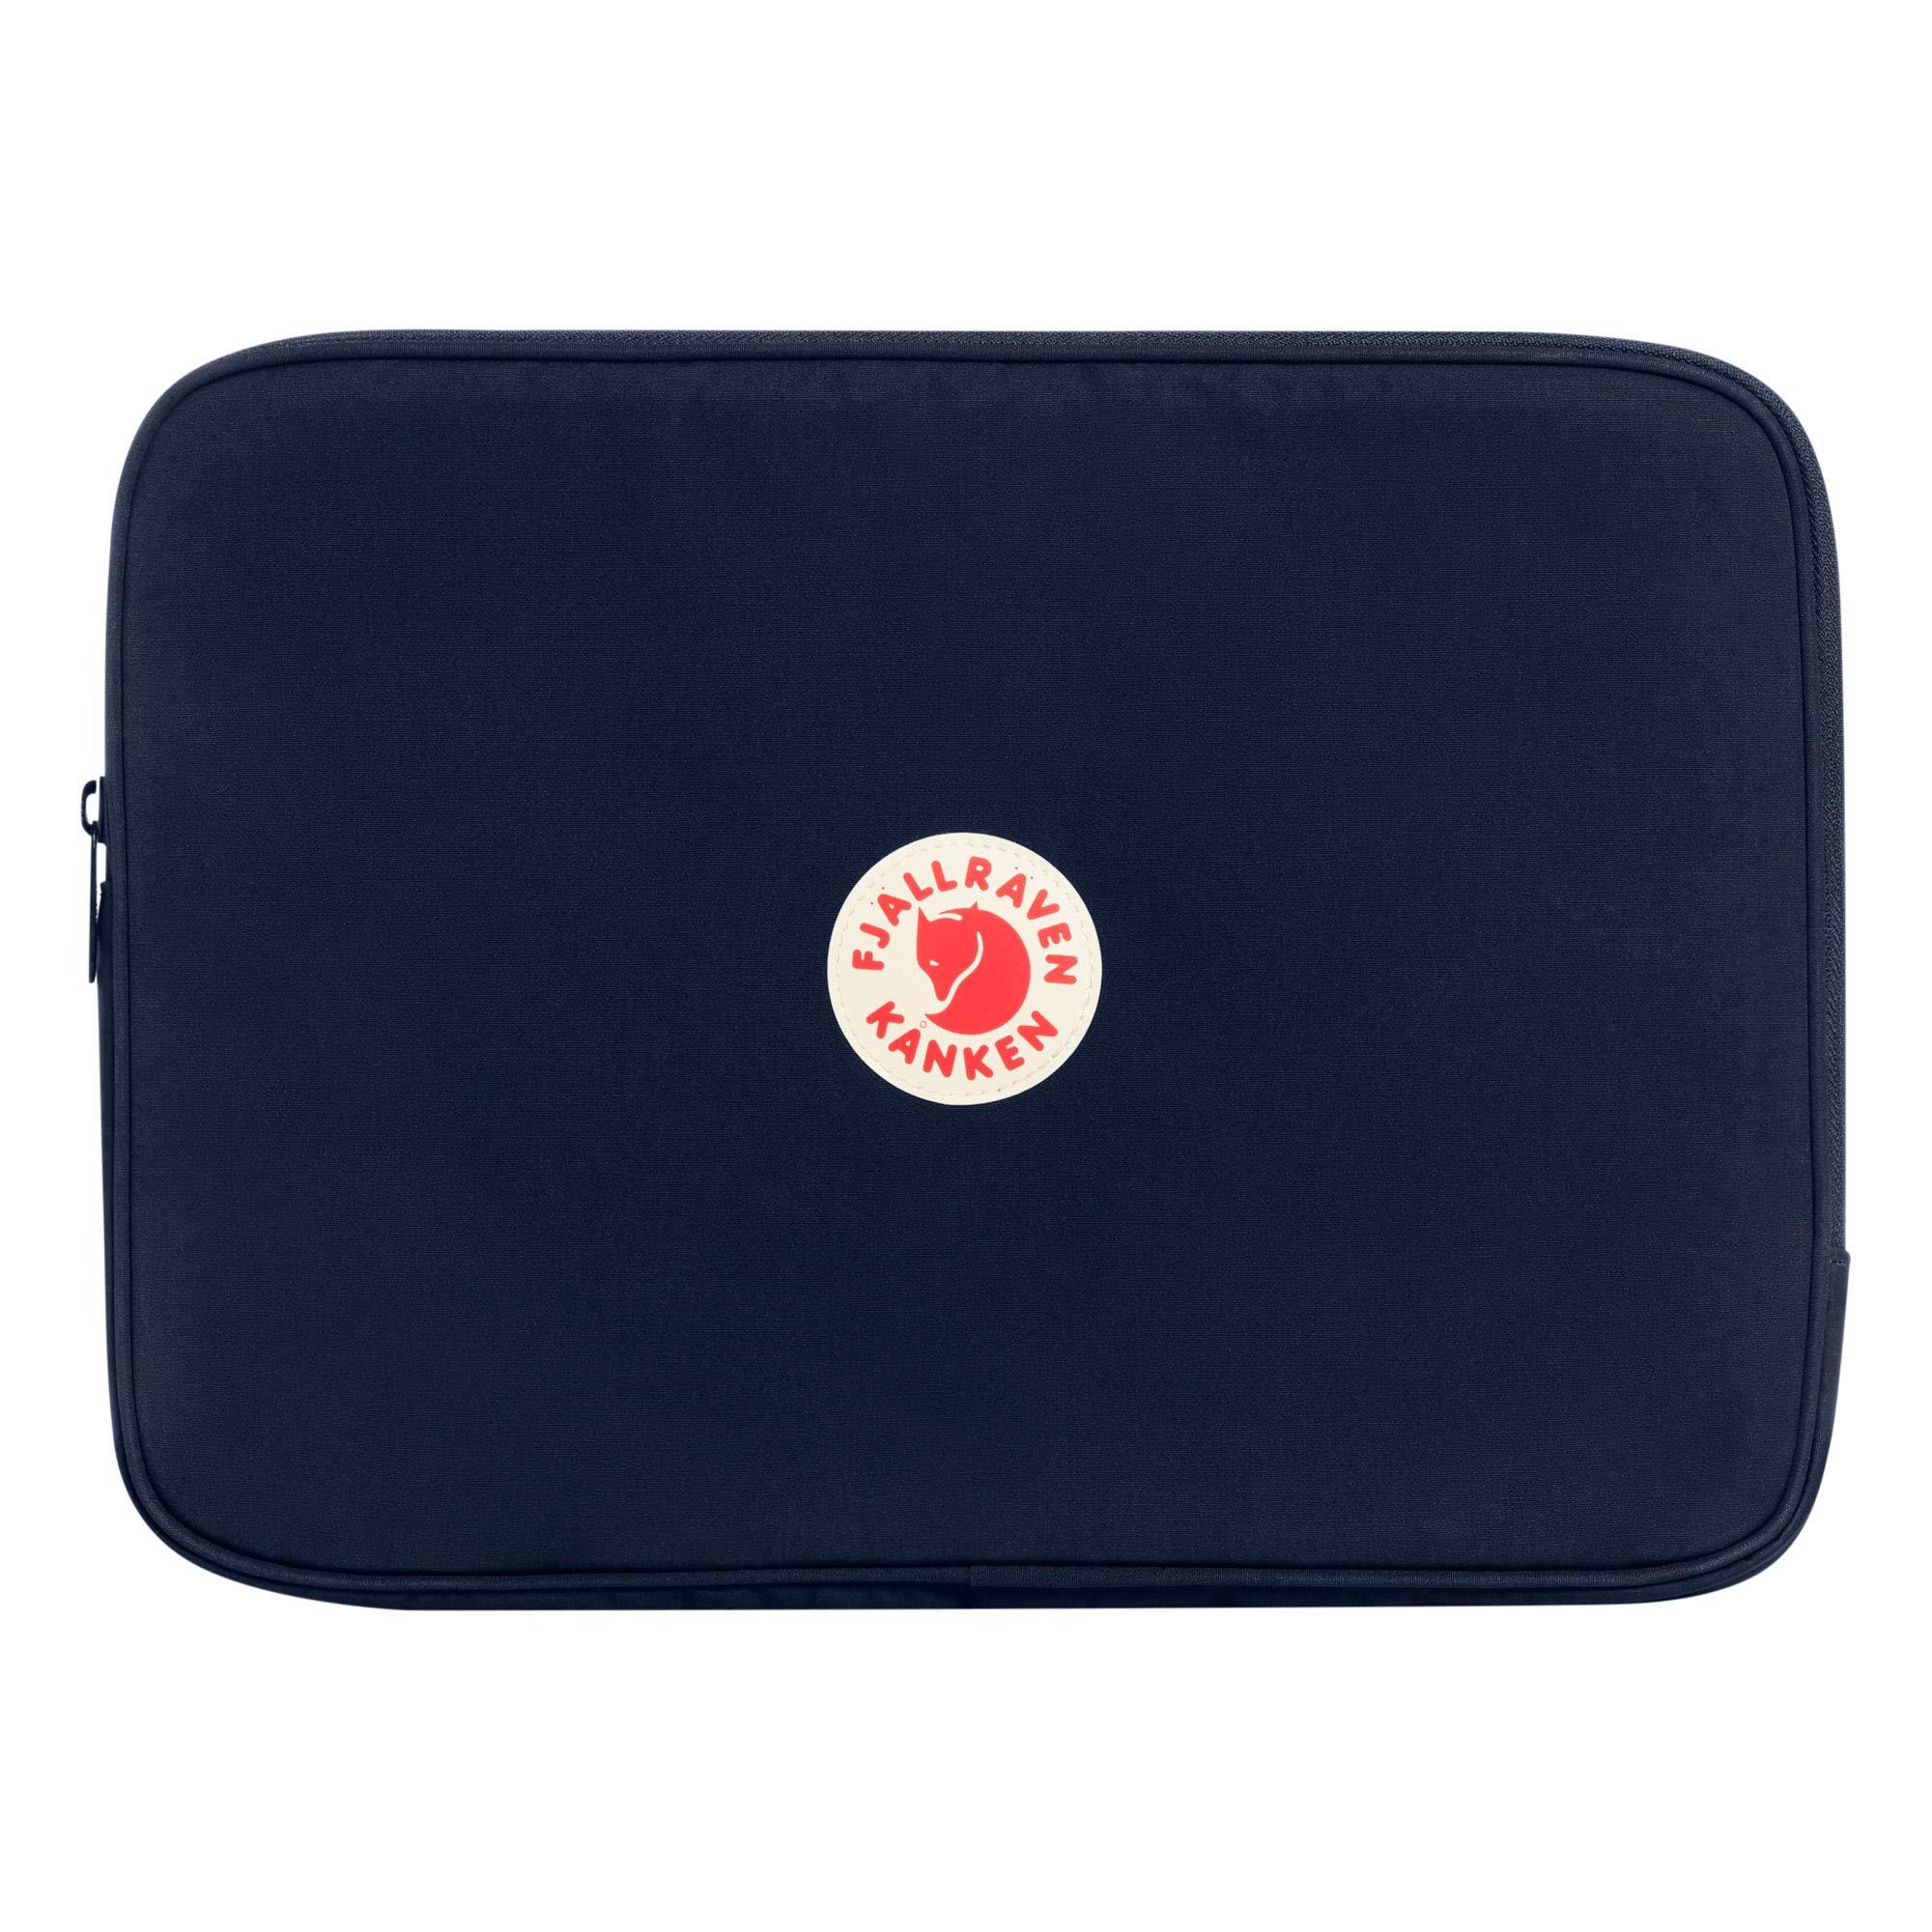 Fjallraven - Kanken Laptop Case 13'' for School and Work, Navy